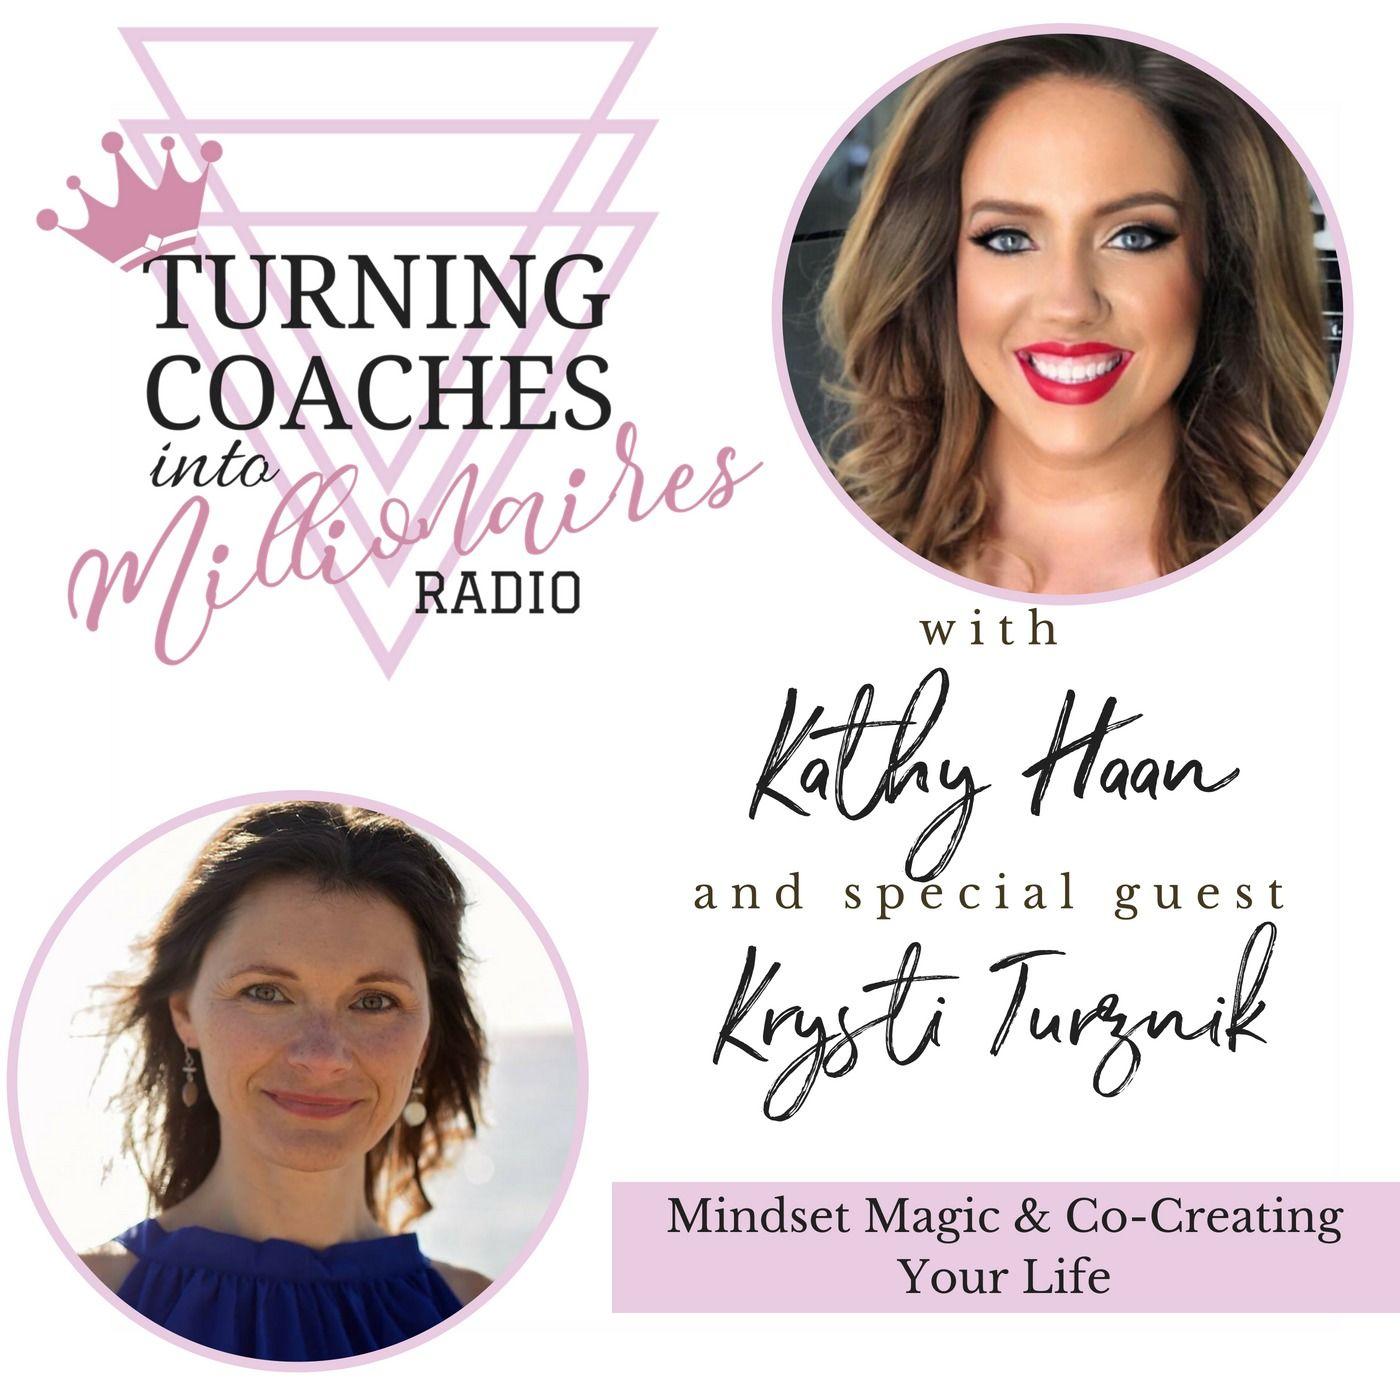 8: Mindset Magic & Co-Creating Your Life with Krysti Turznik